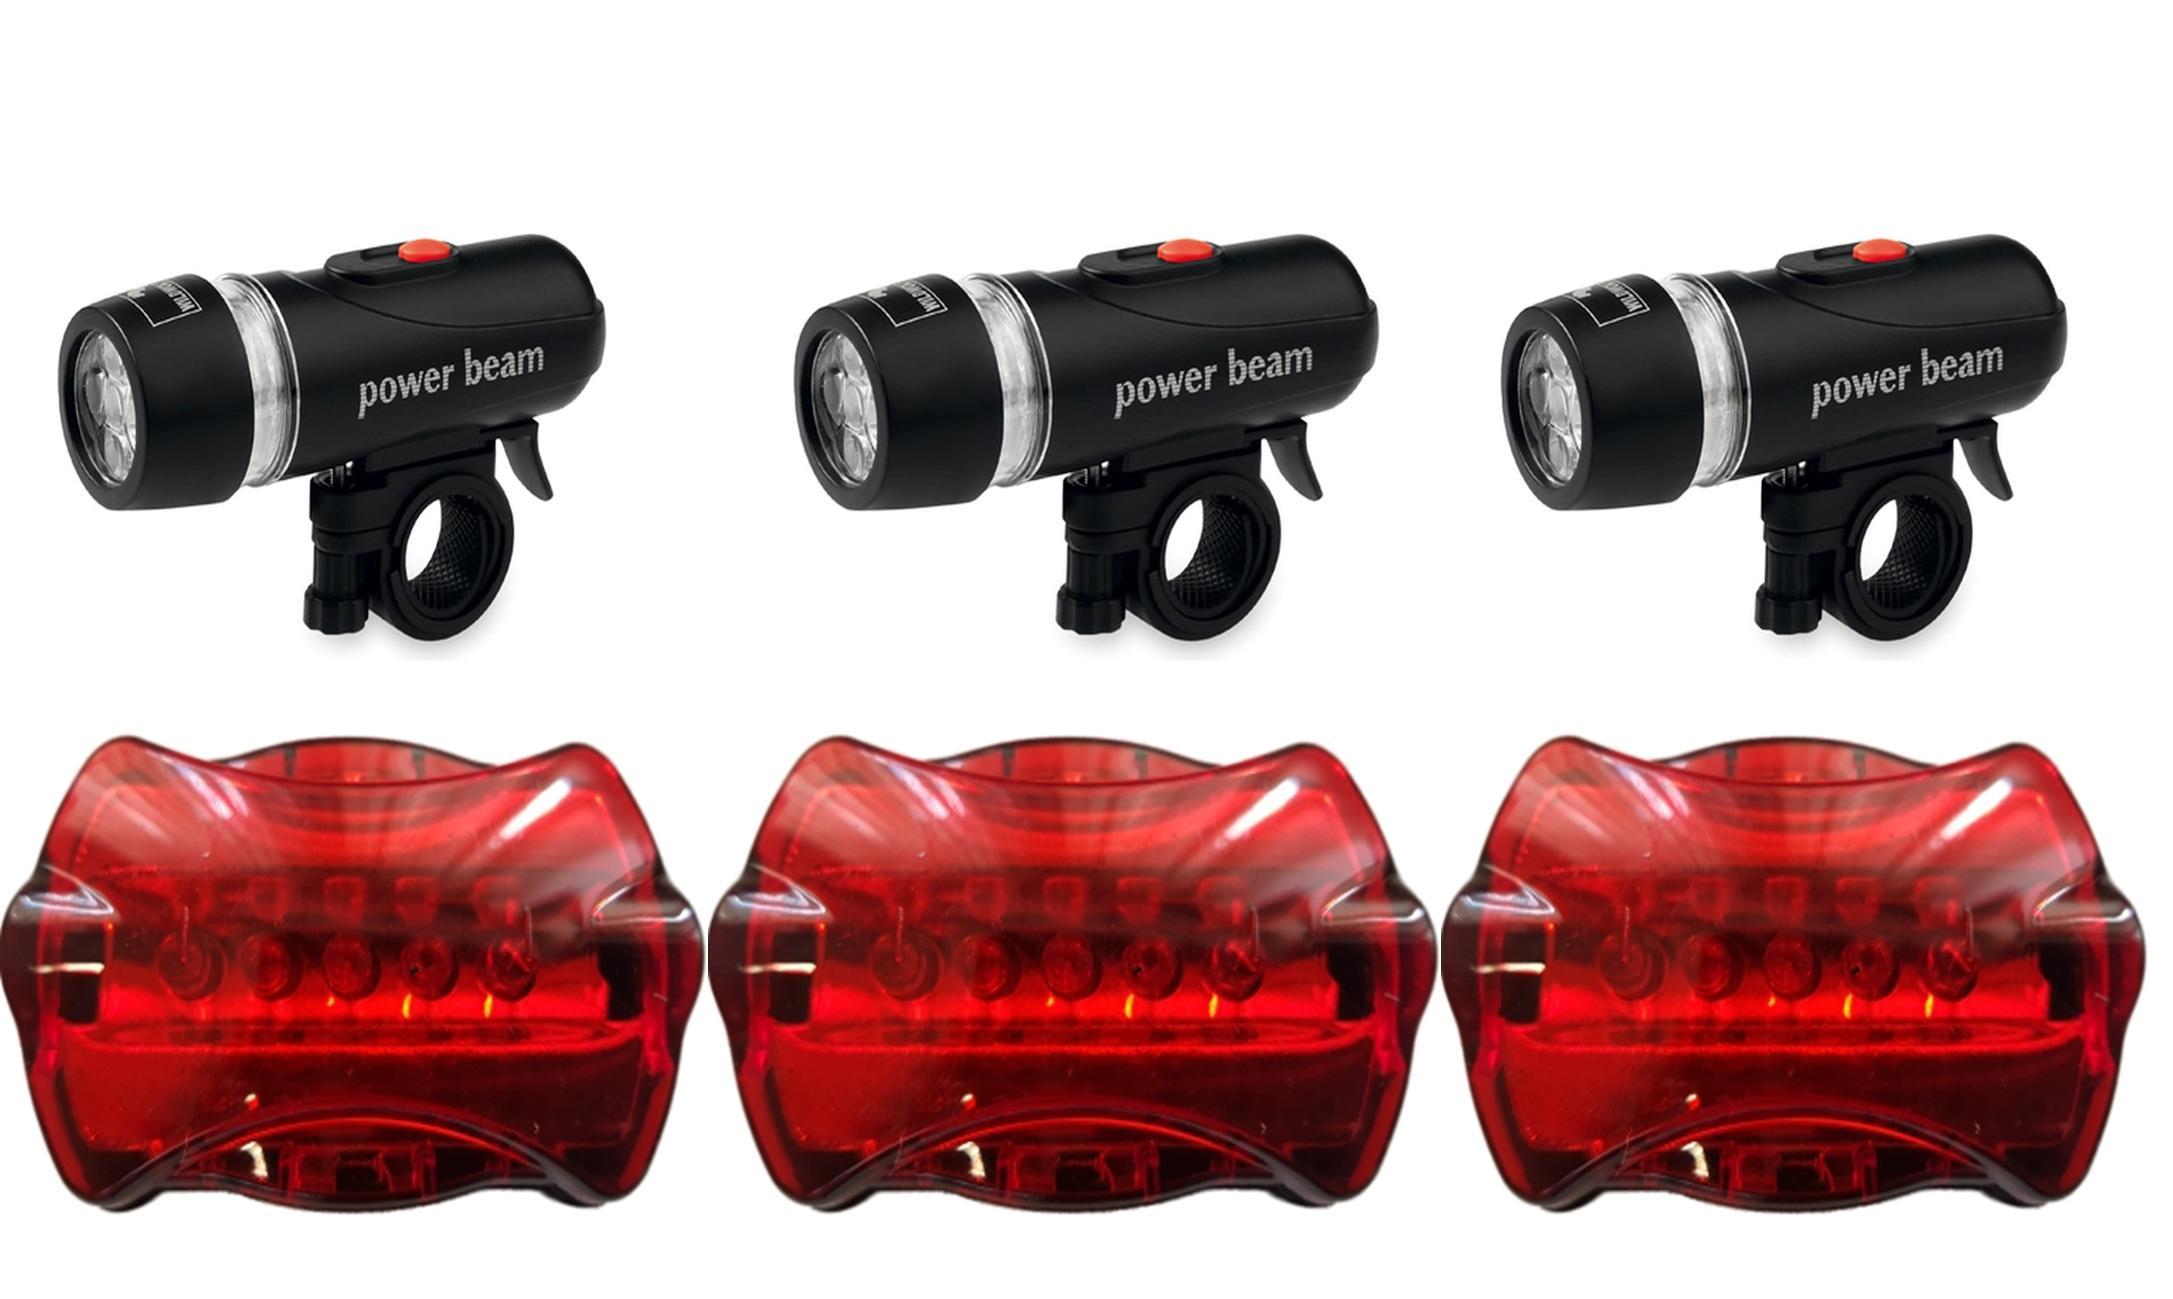 3x led fahrradbeleuchtung fahrradlampe fahrradlicht fahrrad licht lampe set ebay. Black Bedroom Furniture Sets. Home Design Ideas